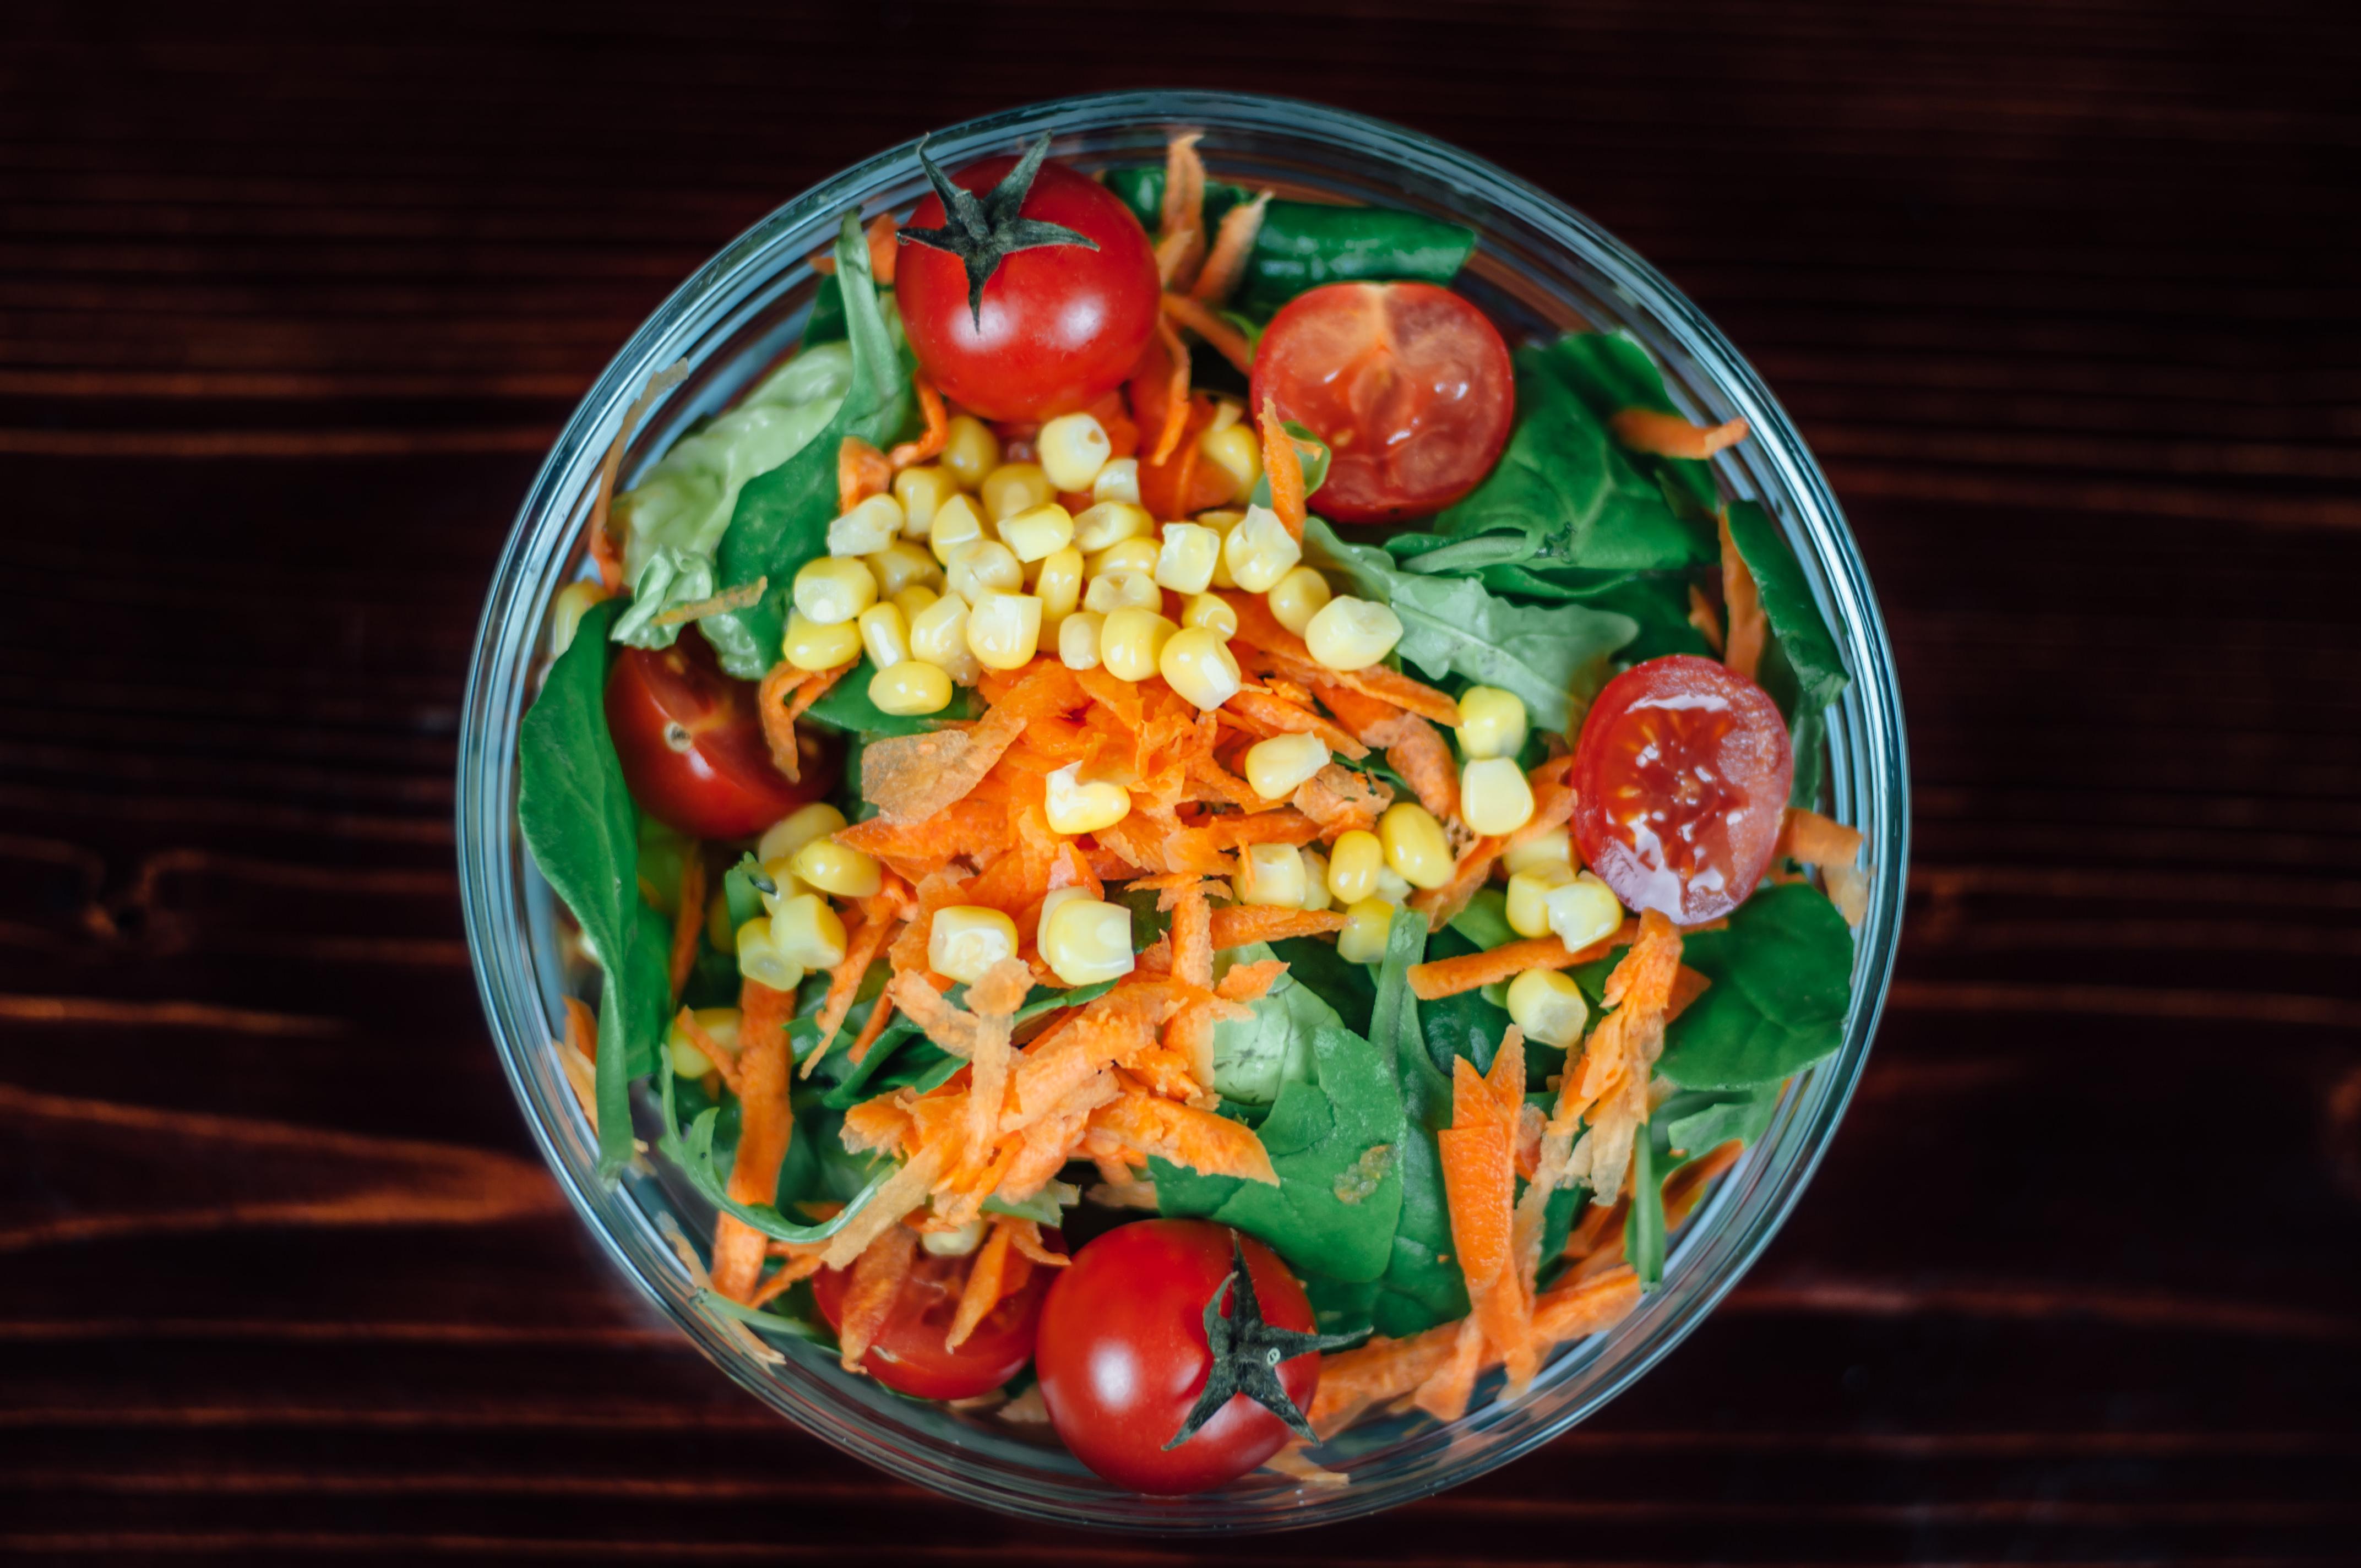 healthy eating sucks